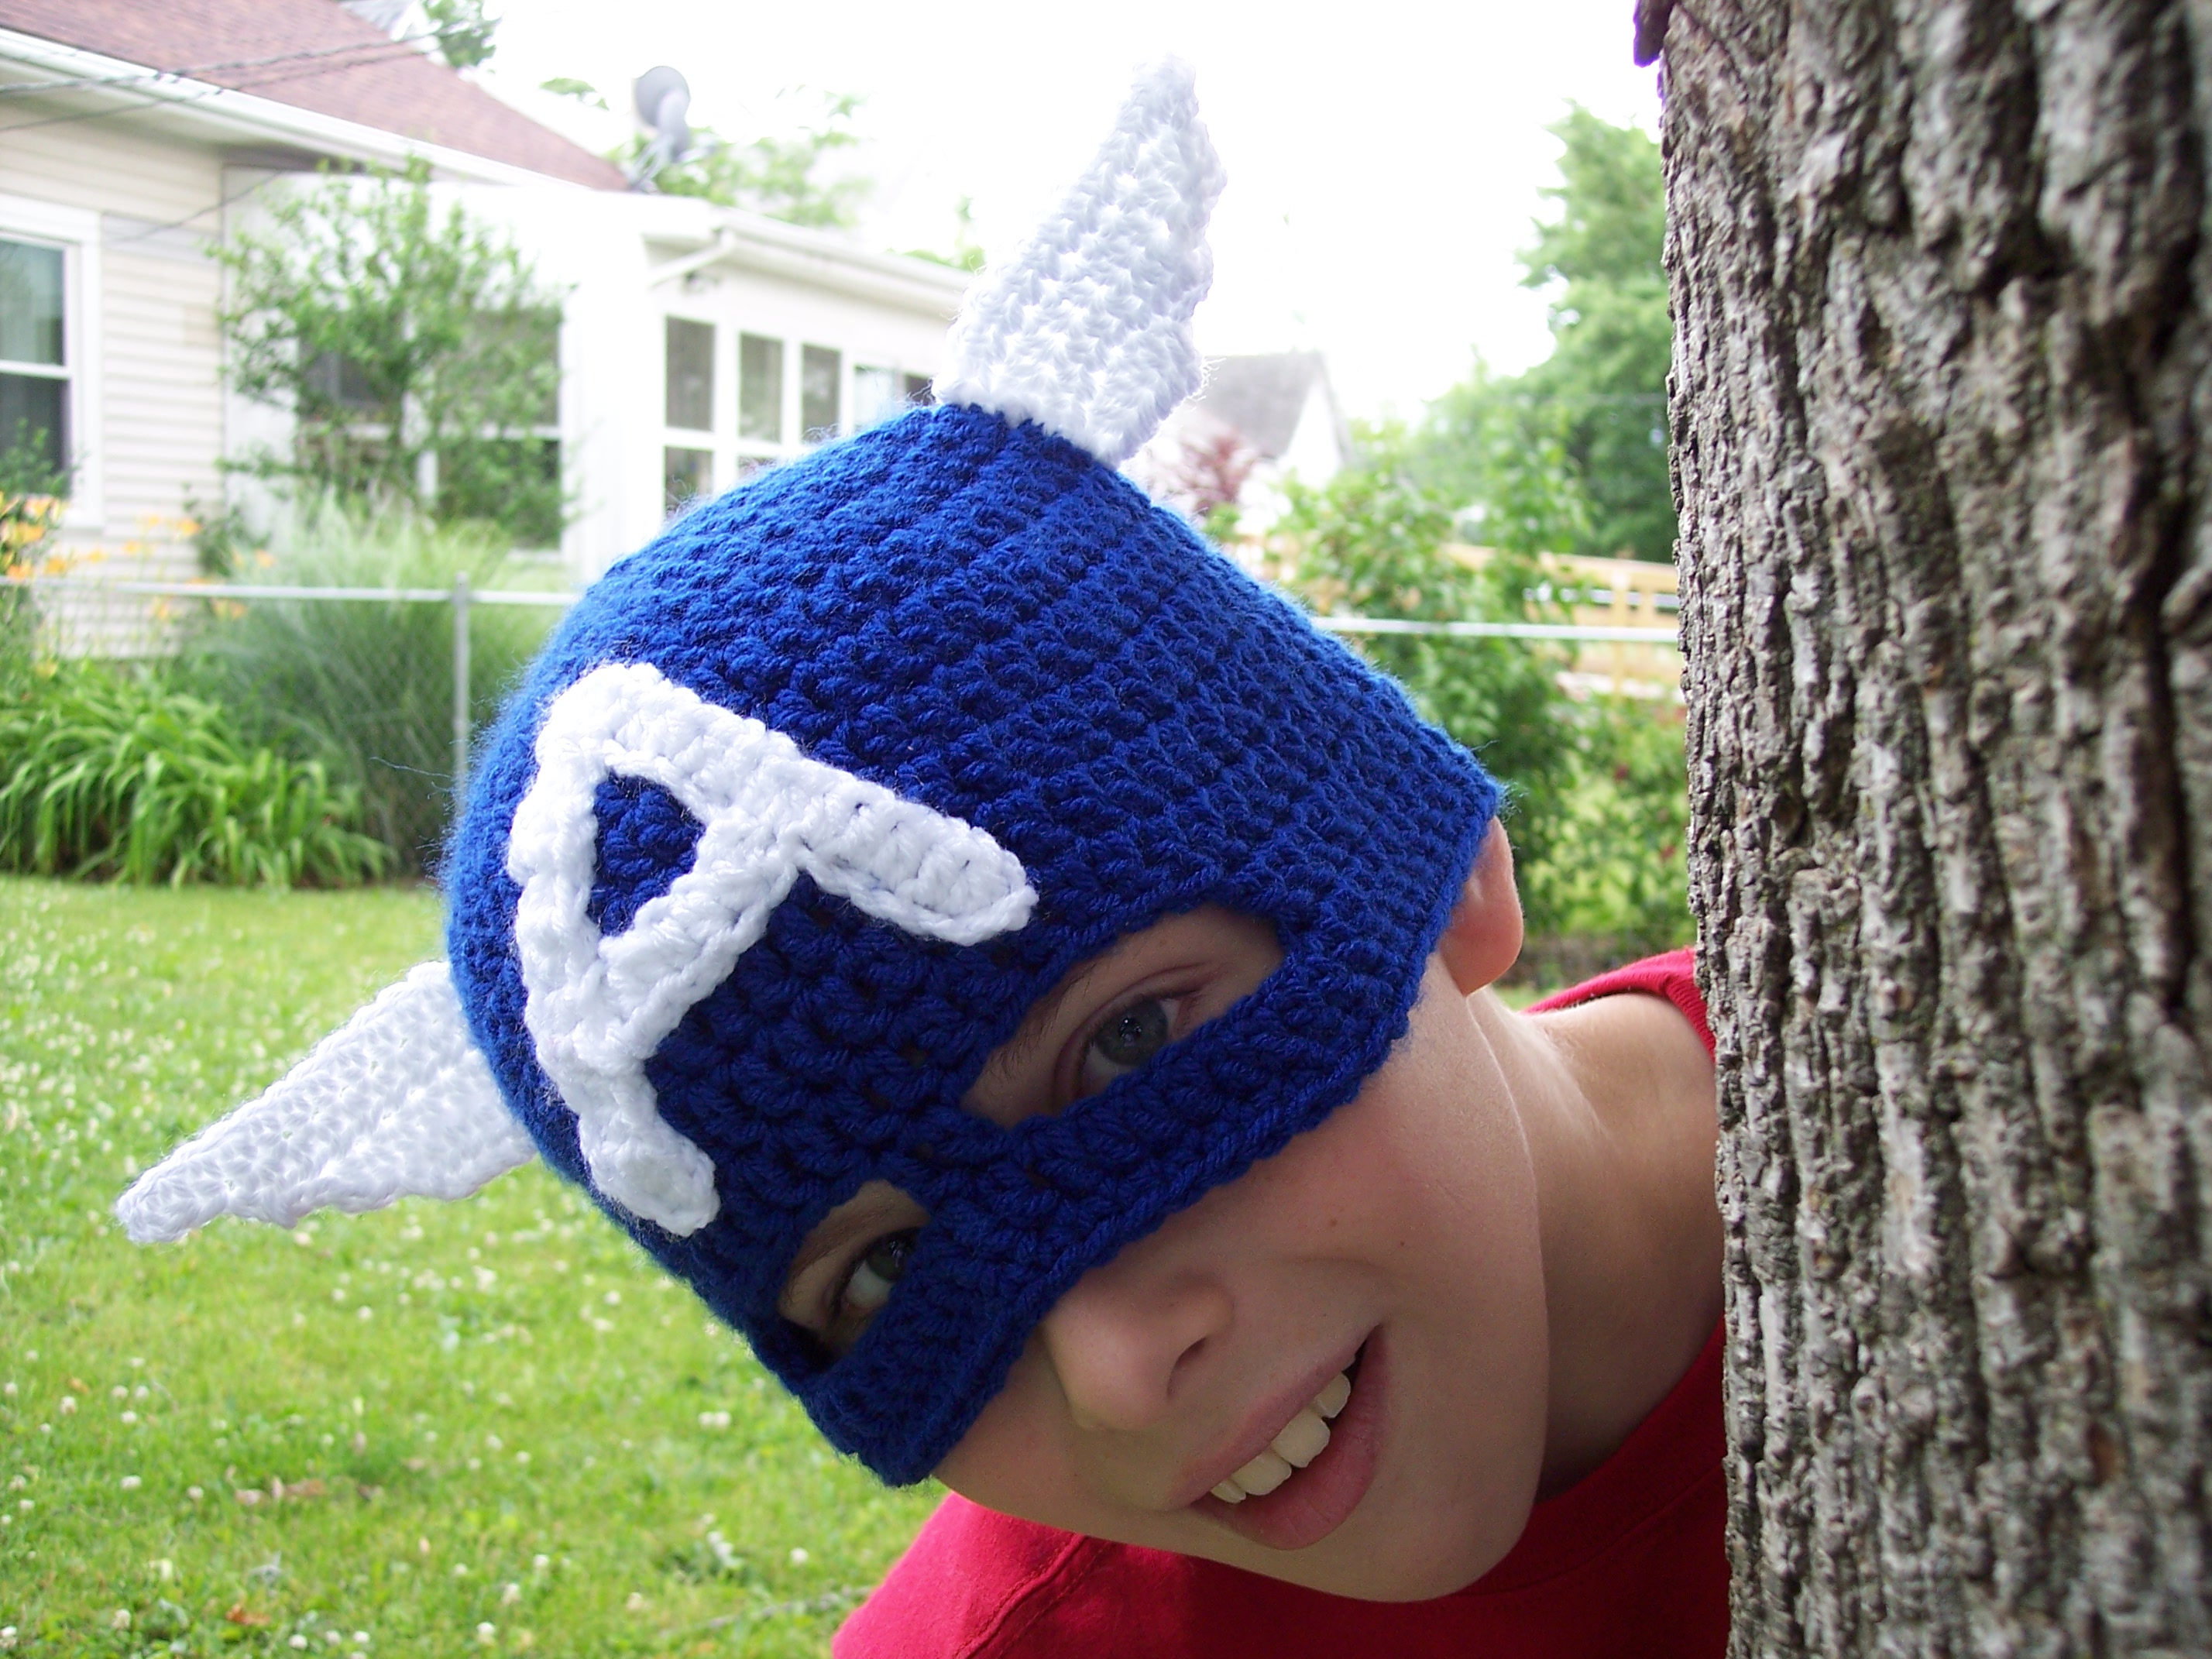 d2798a604ea Captain America! - Stitch11